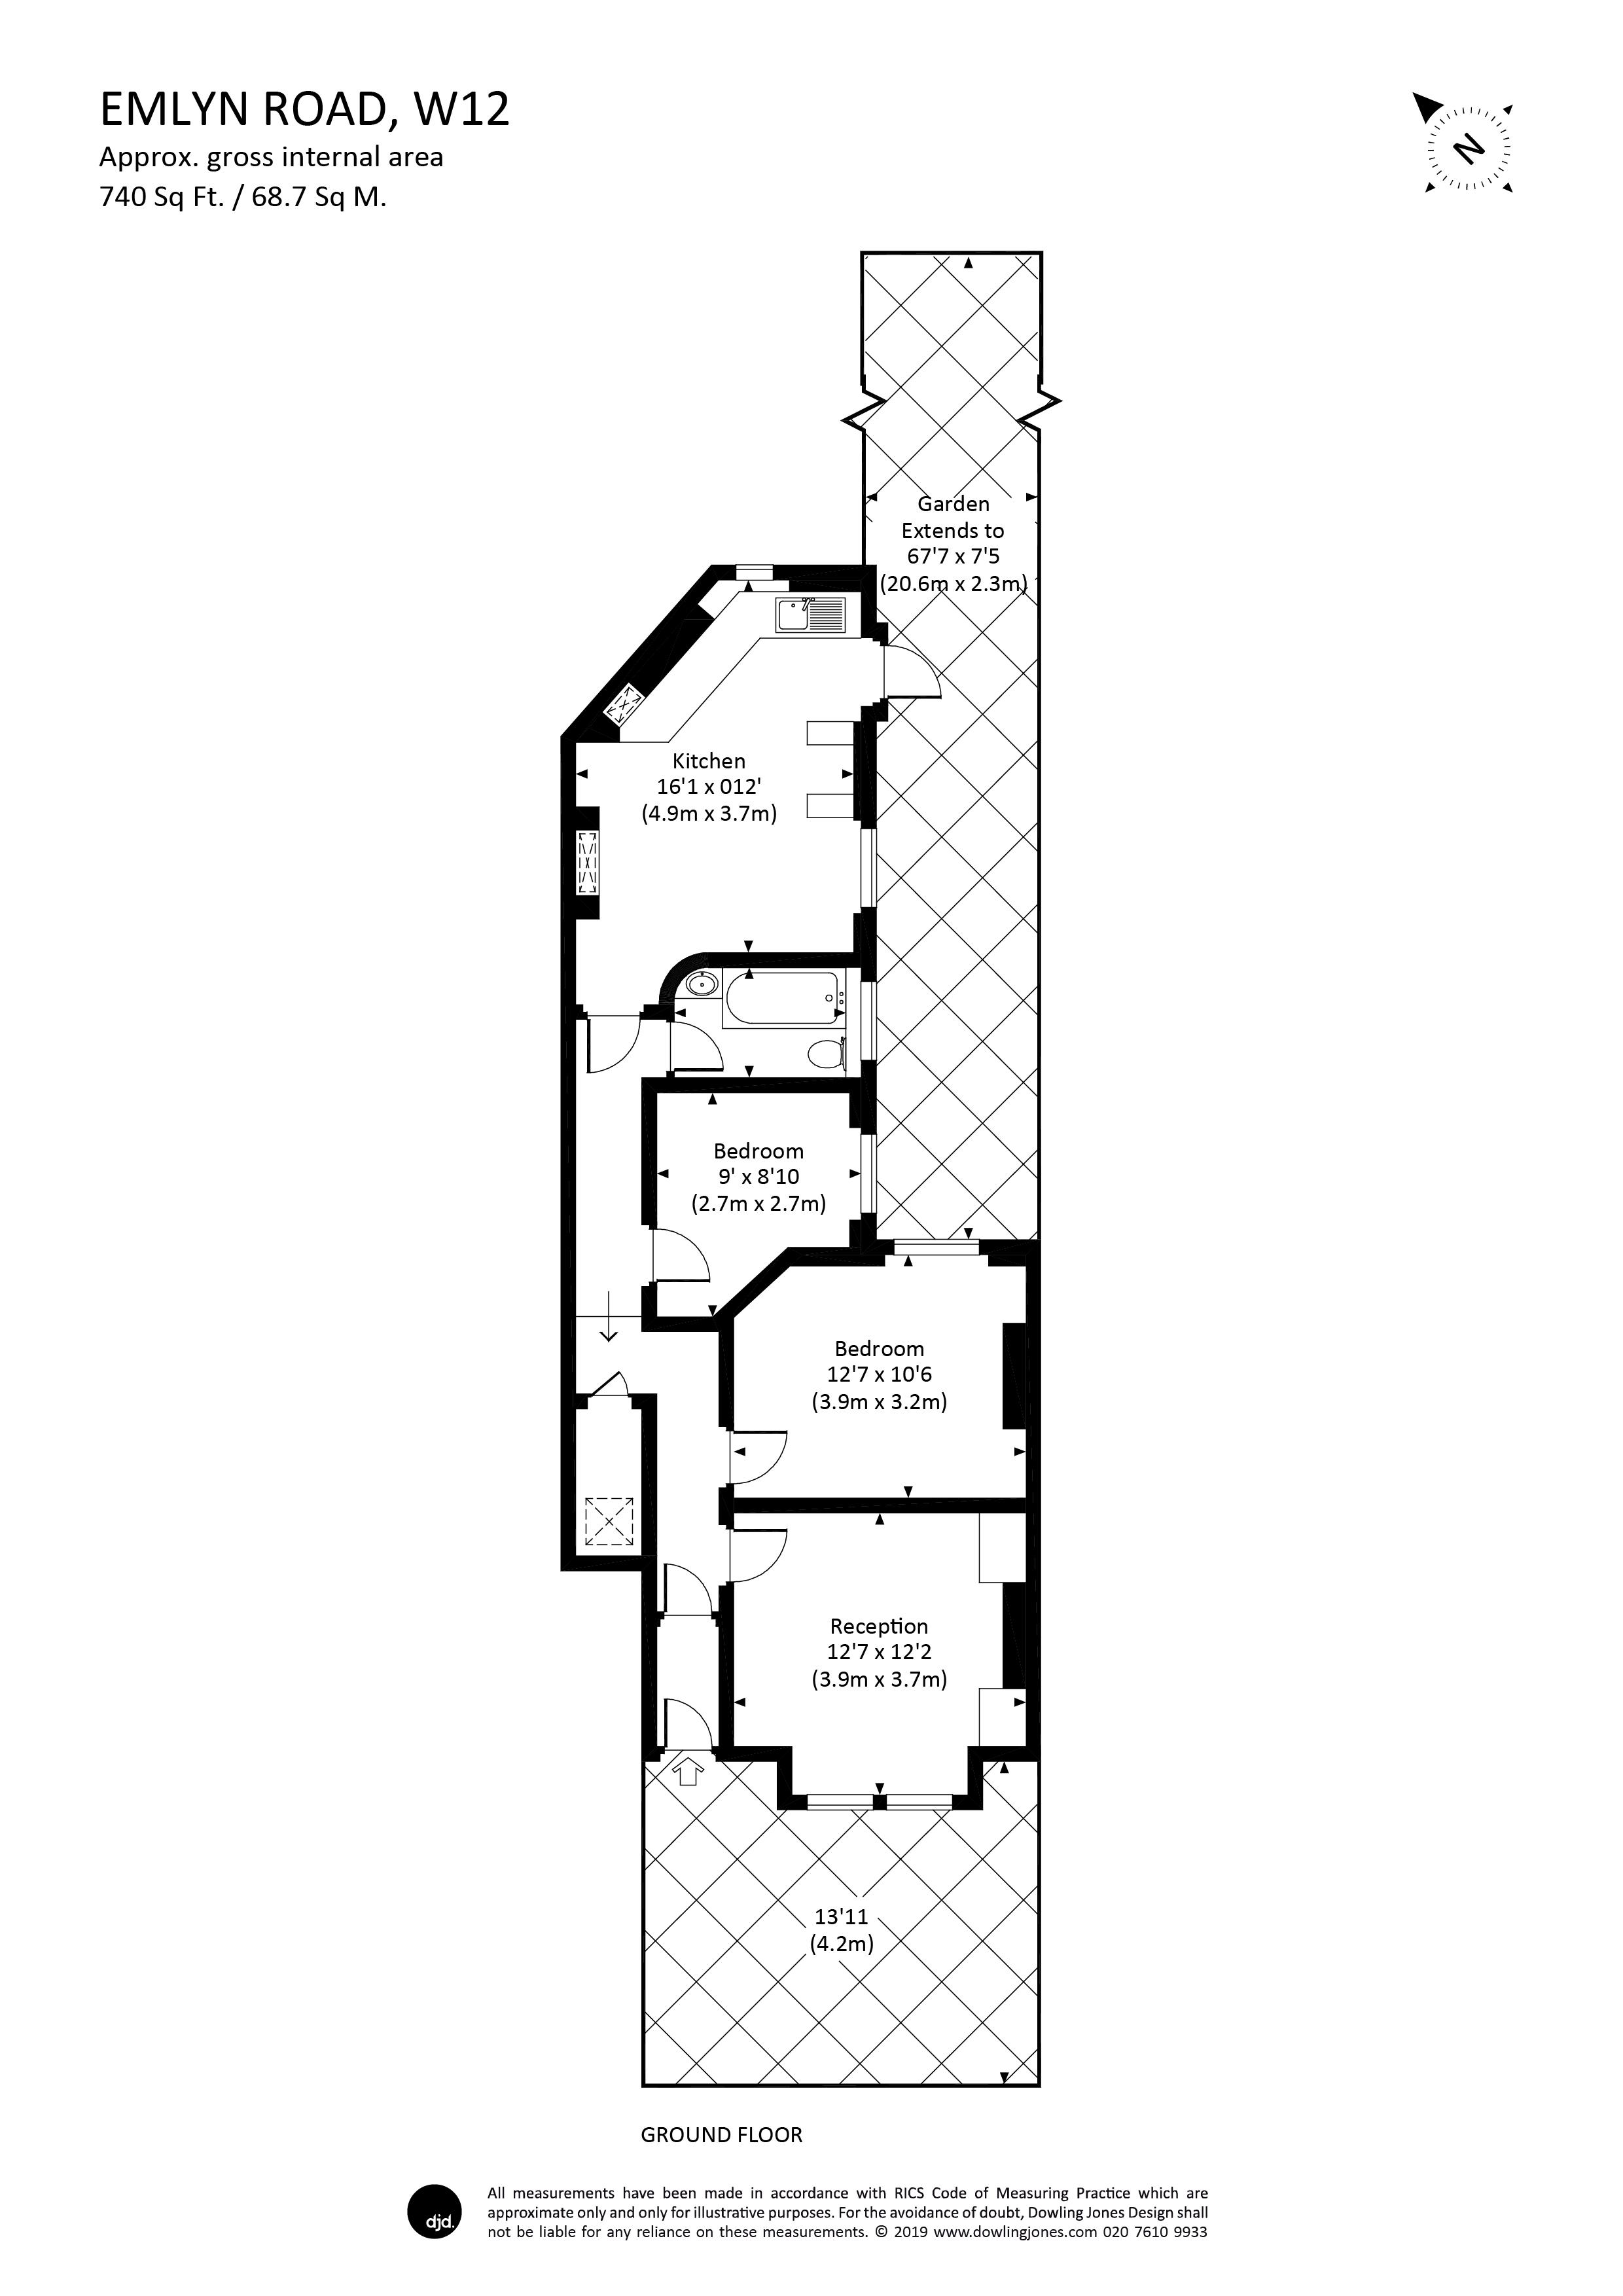 2 Bedroom Property For Sale In Emlyn Road Shepherds Bush